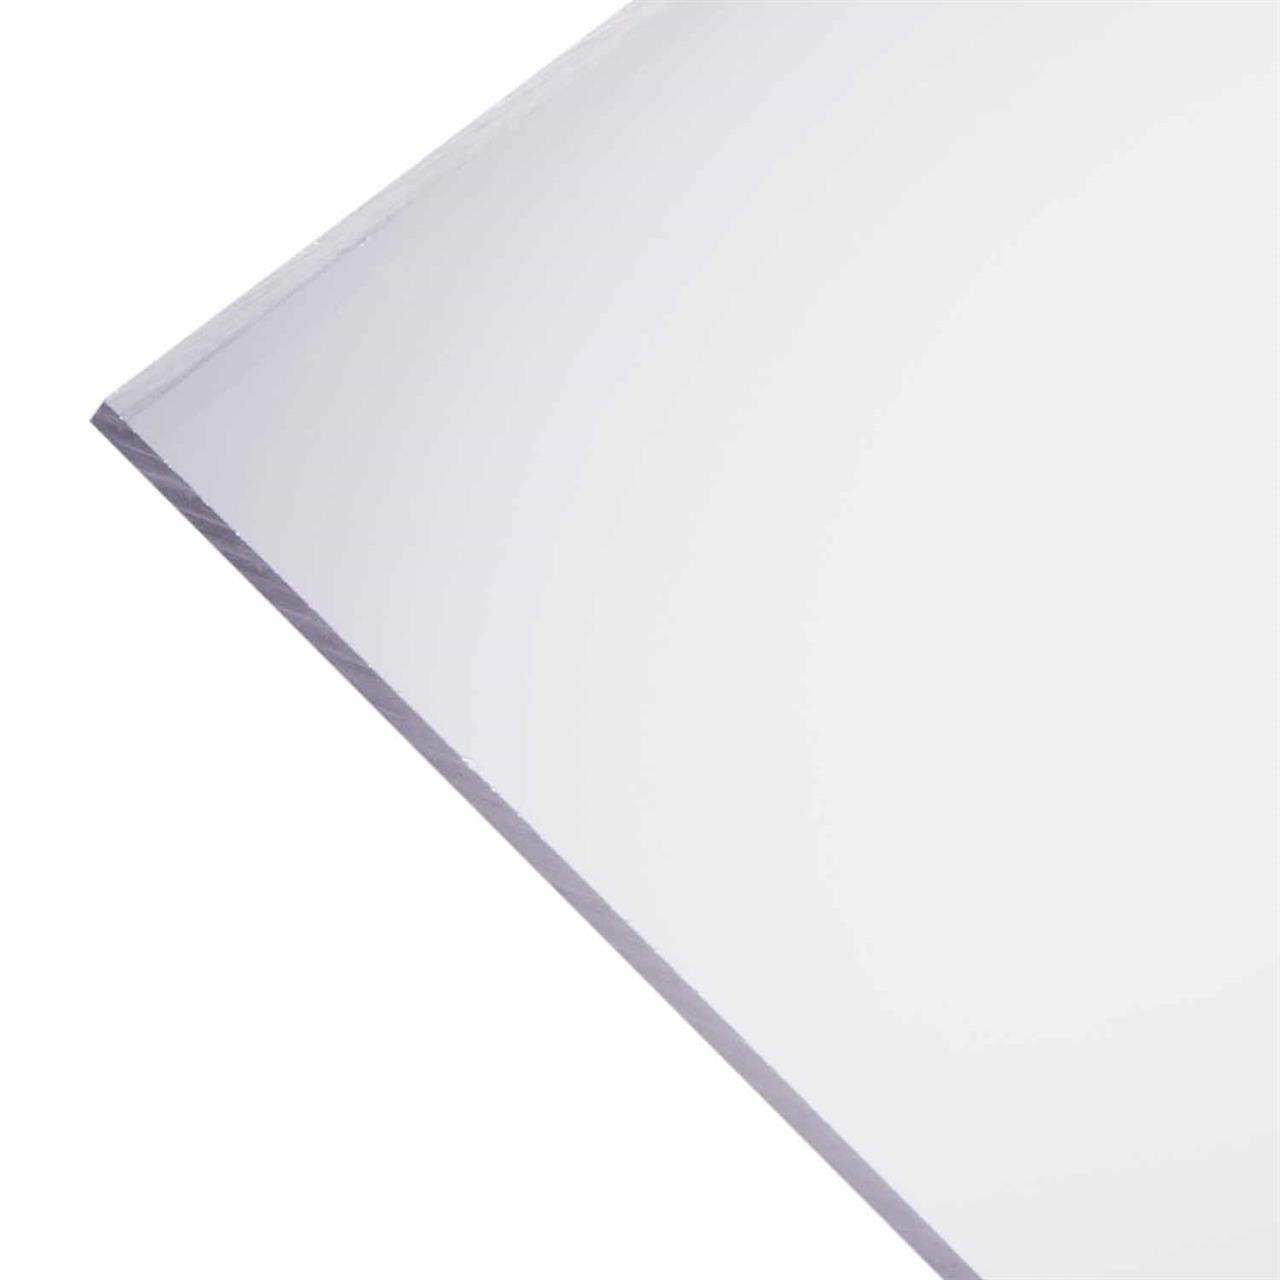 Lexan / Polykarbonat 3,0x1200x800 mm - Klar